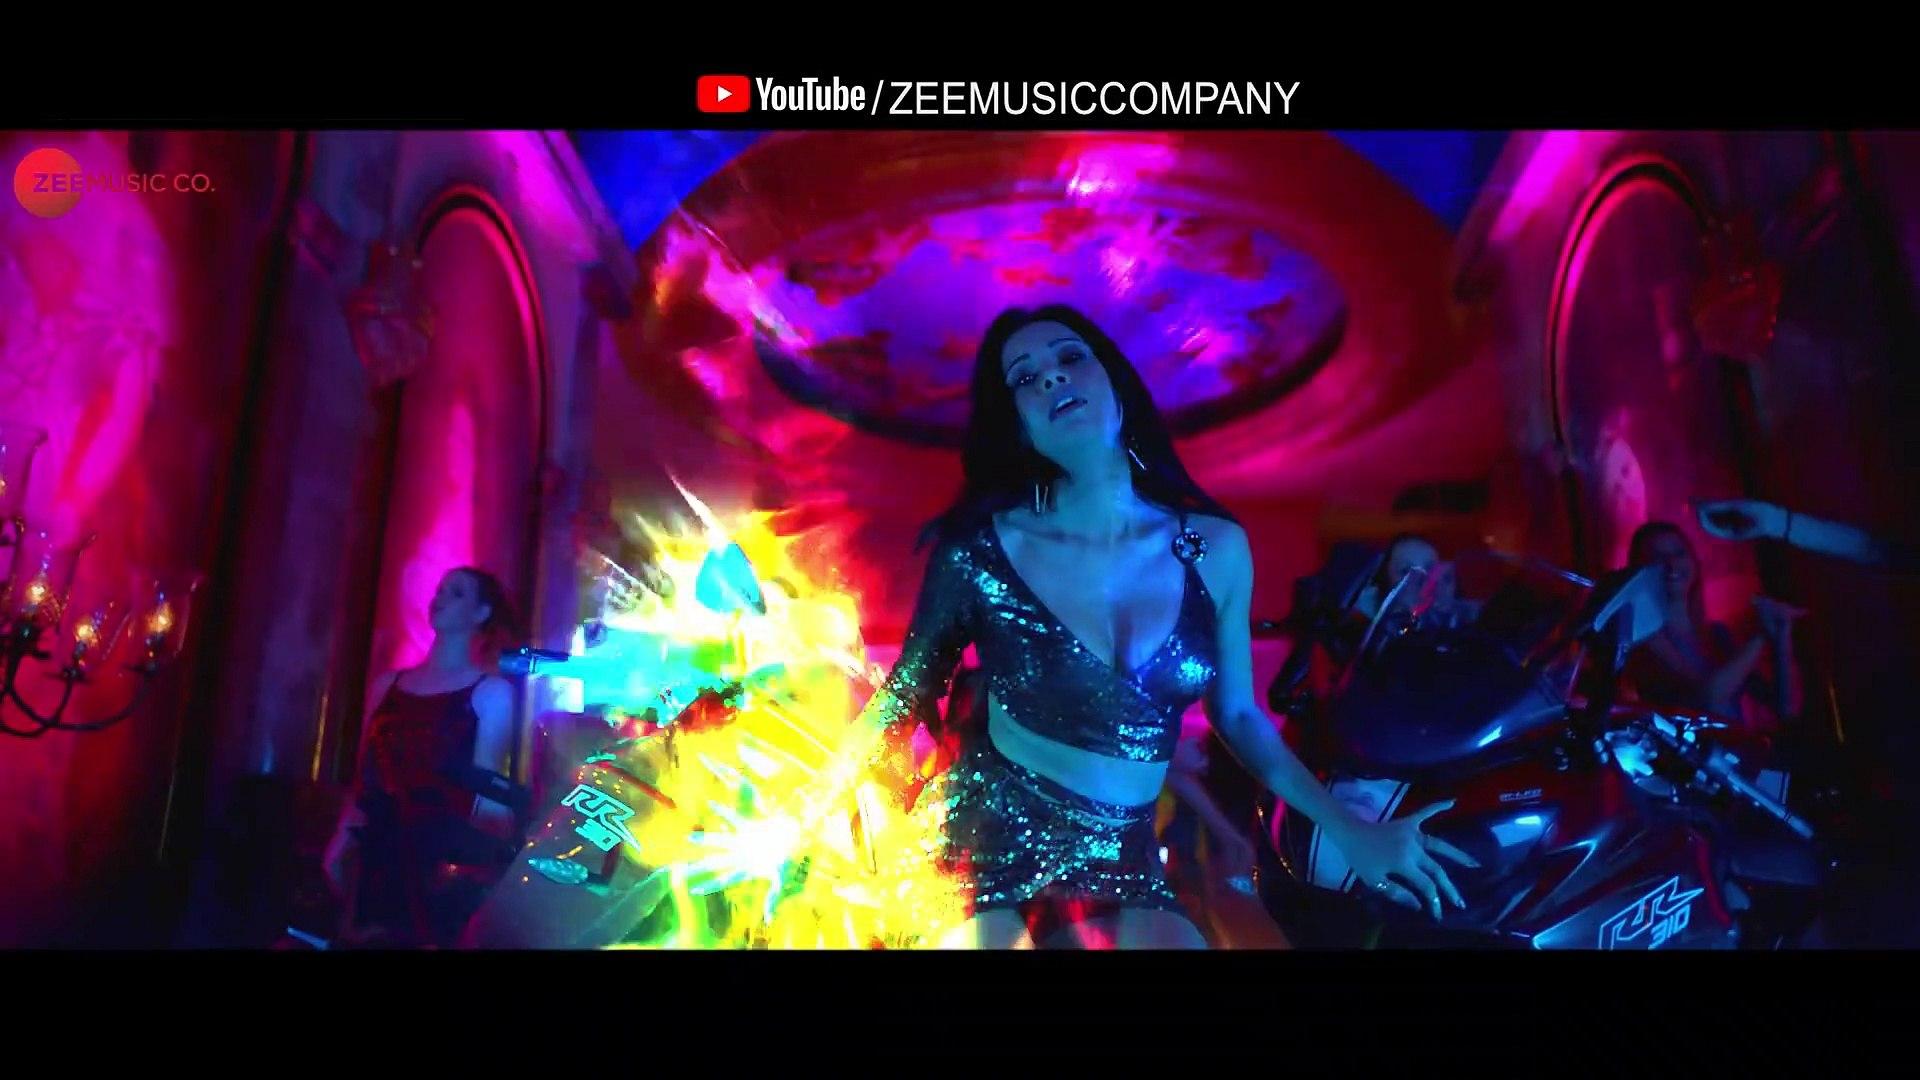 Gat Gat Dream Girl Ayushmann K & Nushrat B Meet Bros Ft. Jass Zaildar & Khushboo Grewal Kuma